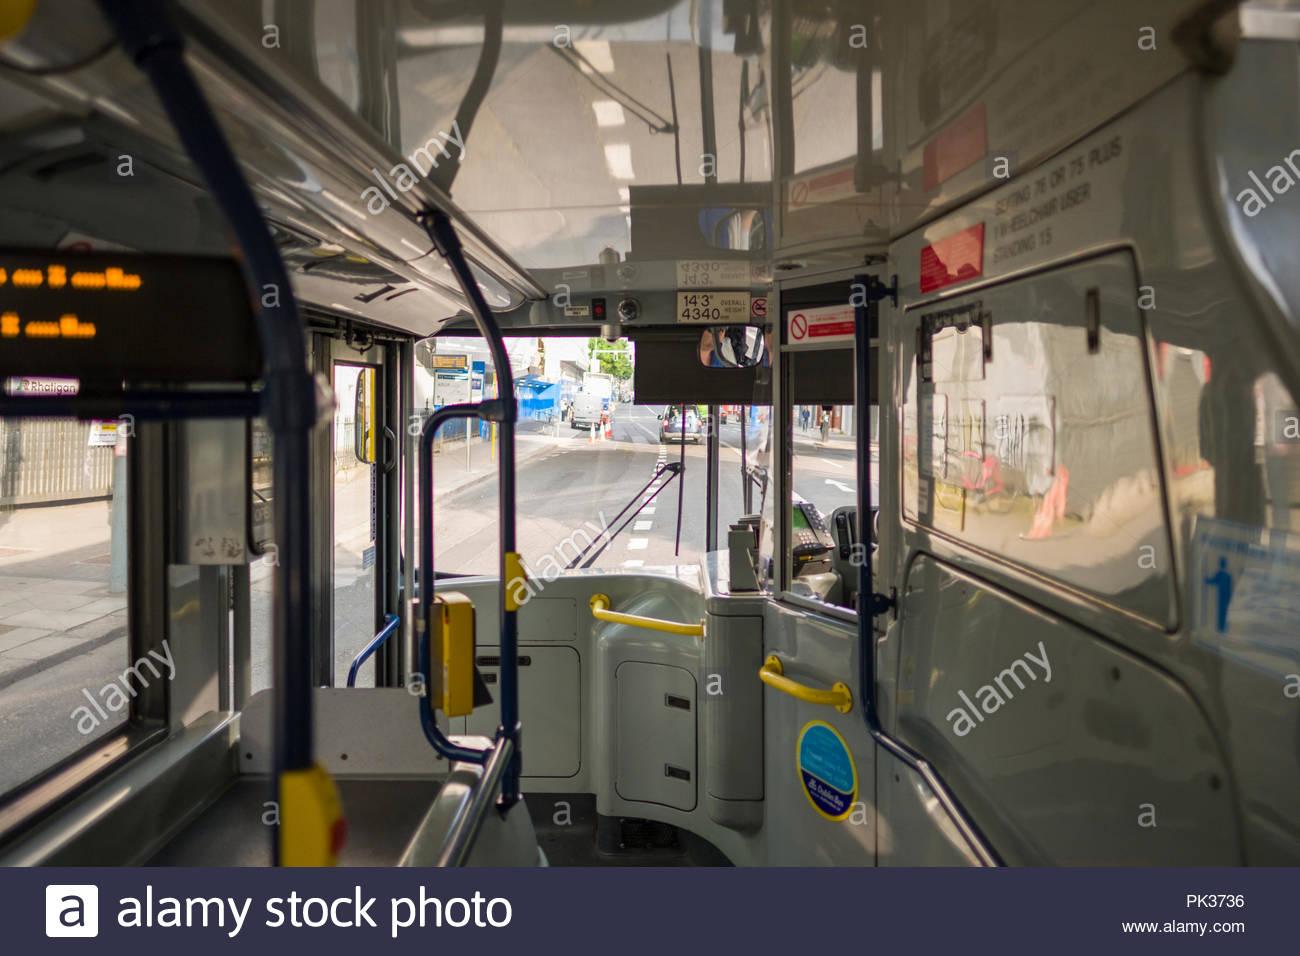 Inside an Alexander Dennis Enviro400 bodied Volvo B9TL Dublin Bus on Pearse Street, Docklands, Dublin, Leinster, Ireland - Stock Image